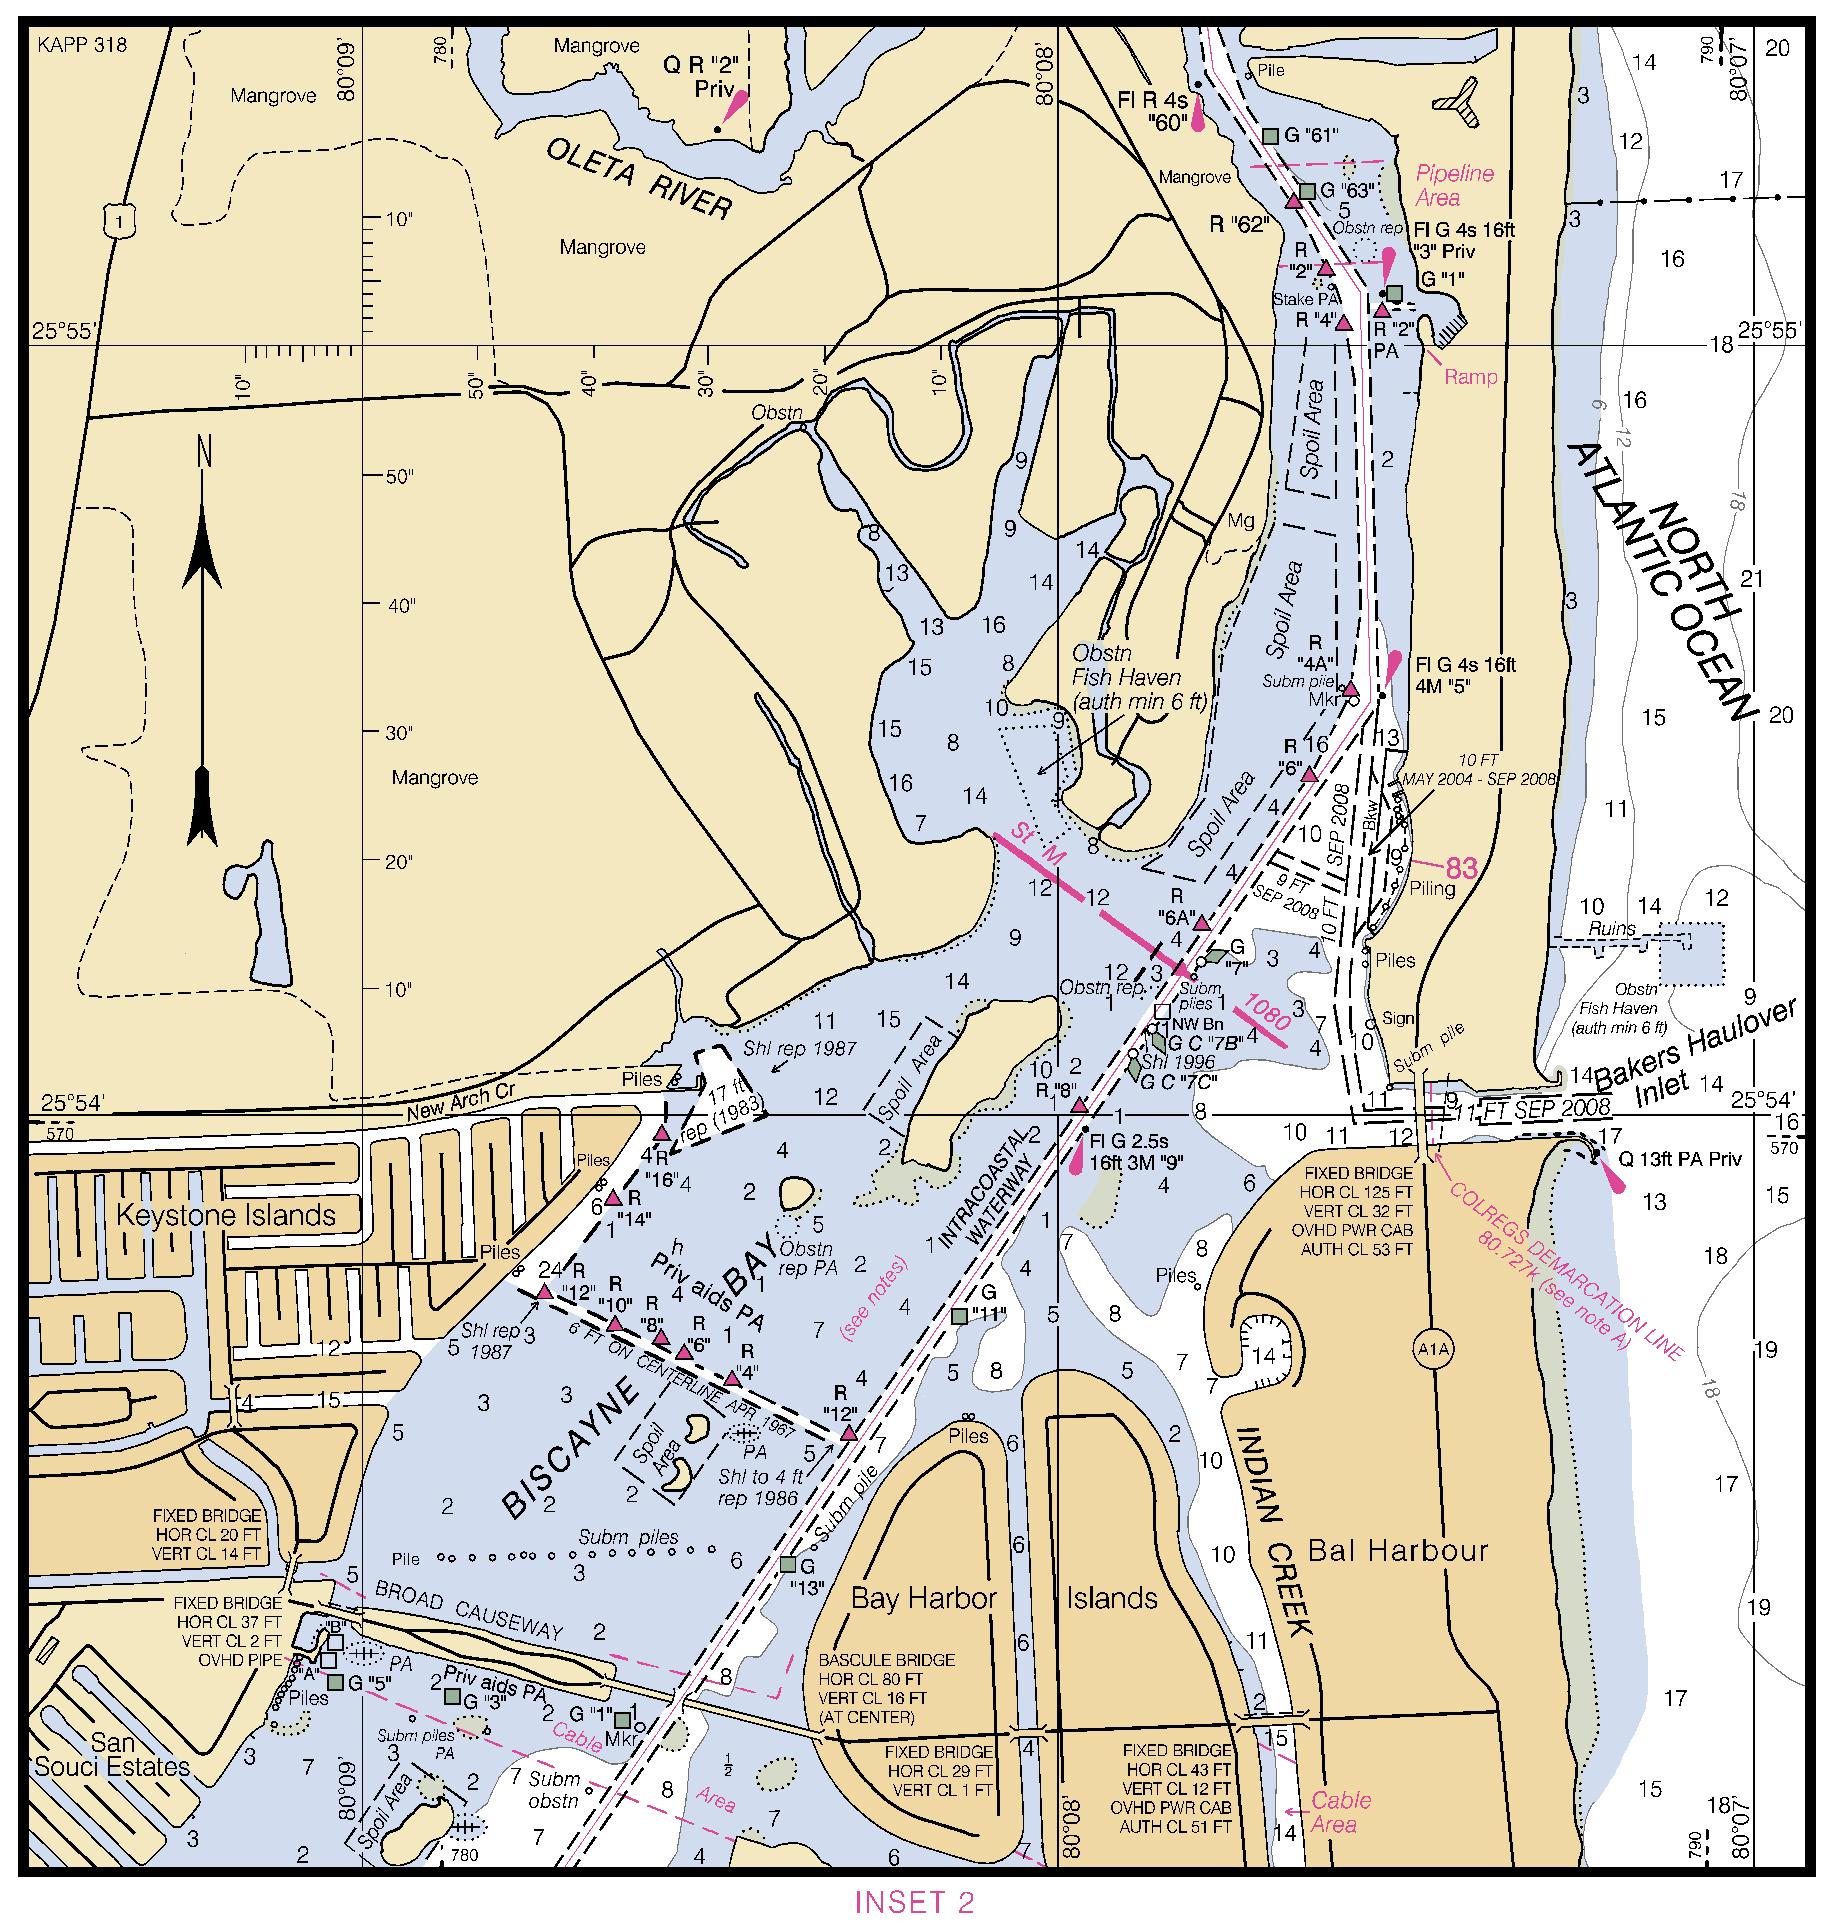 INTRACOASTAL WATERWAY - BISCAYNE BAY nautical chart - ΝΟΑΑ Charts - maps